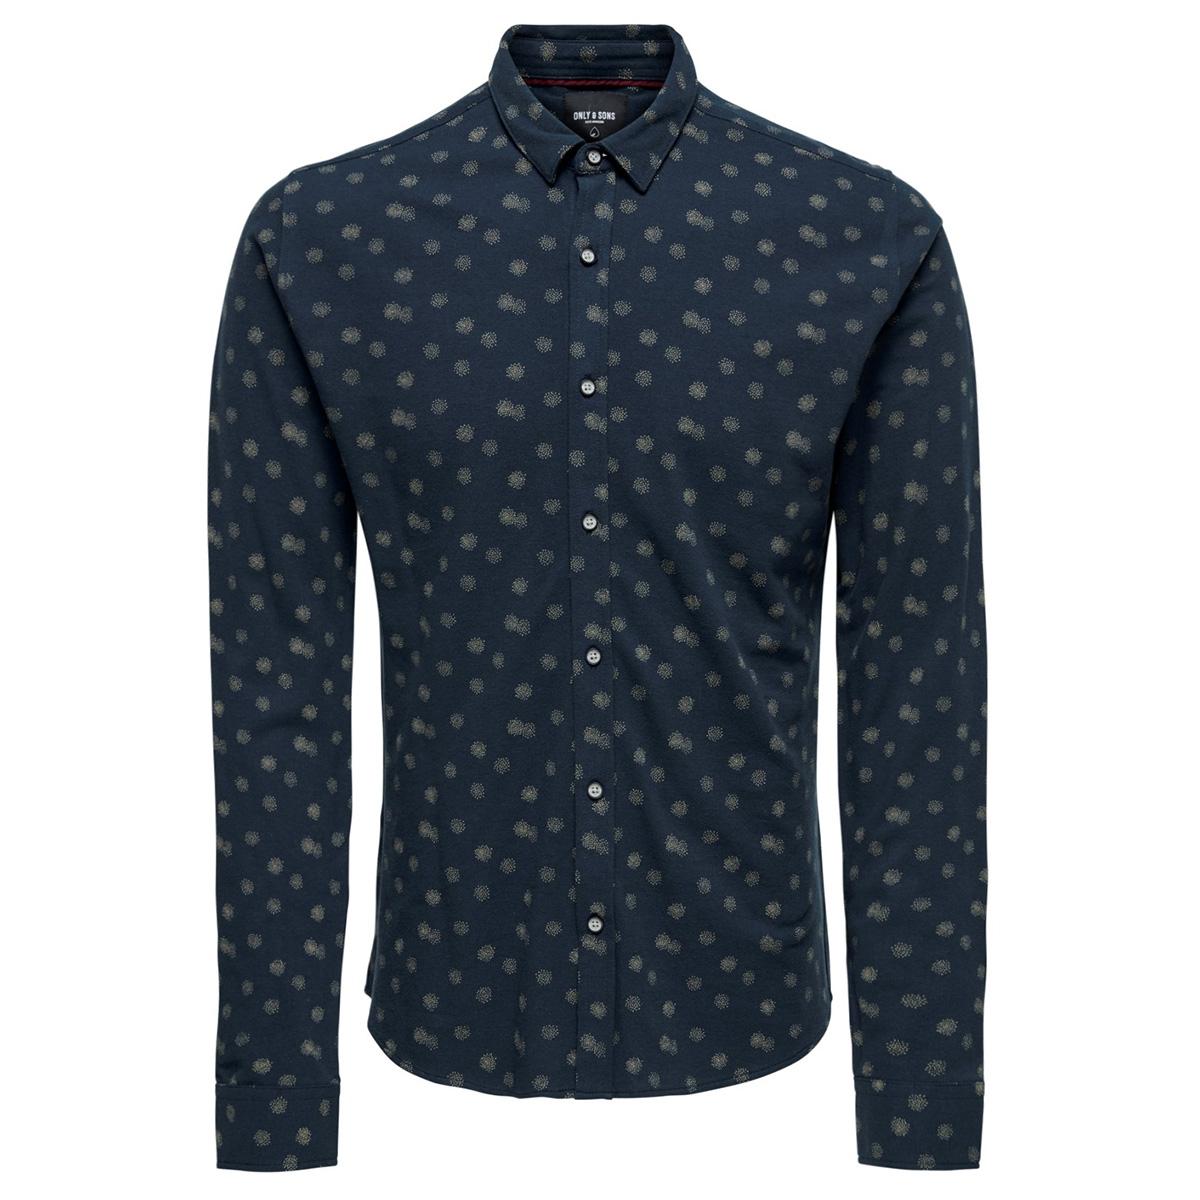 onscuton ls knitted melange aop shi 22013847 only & sons overhemd dress blues